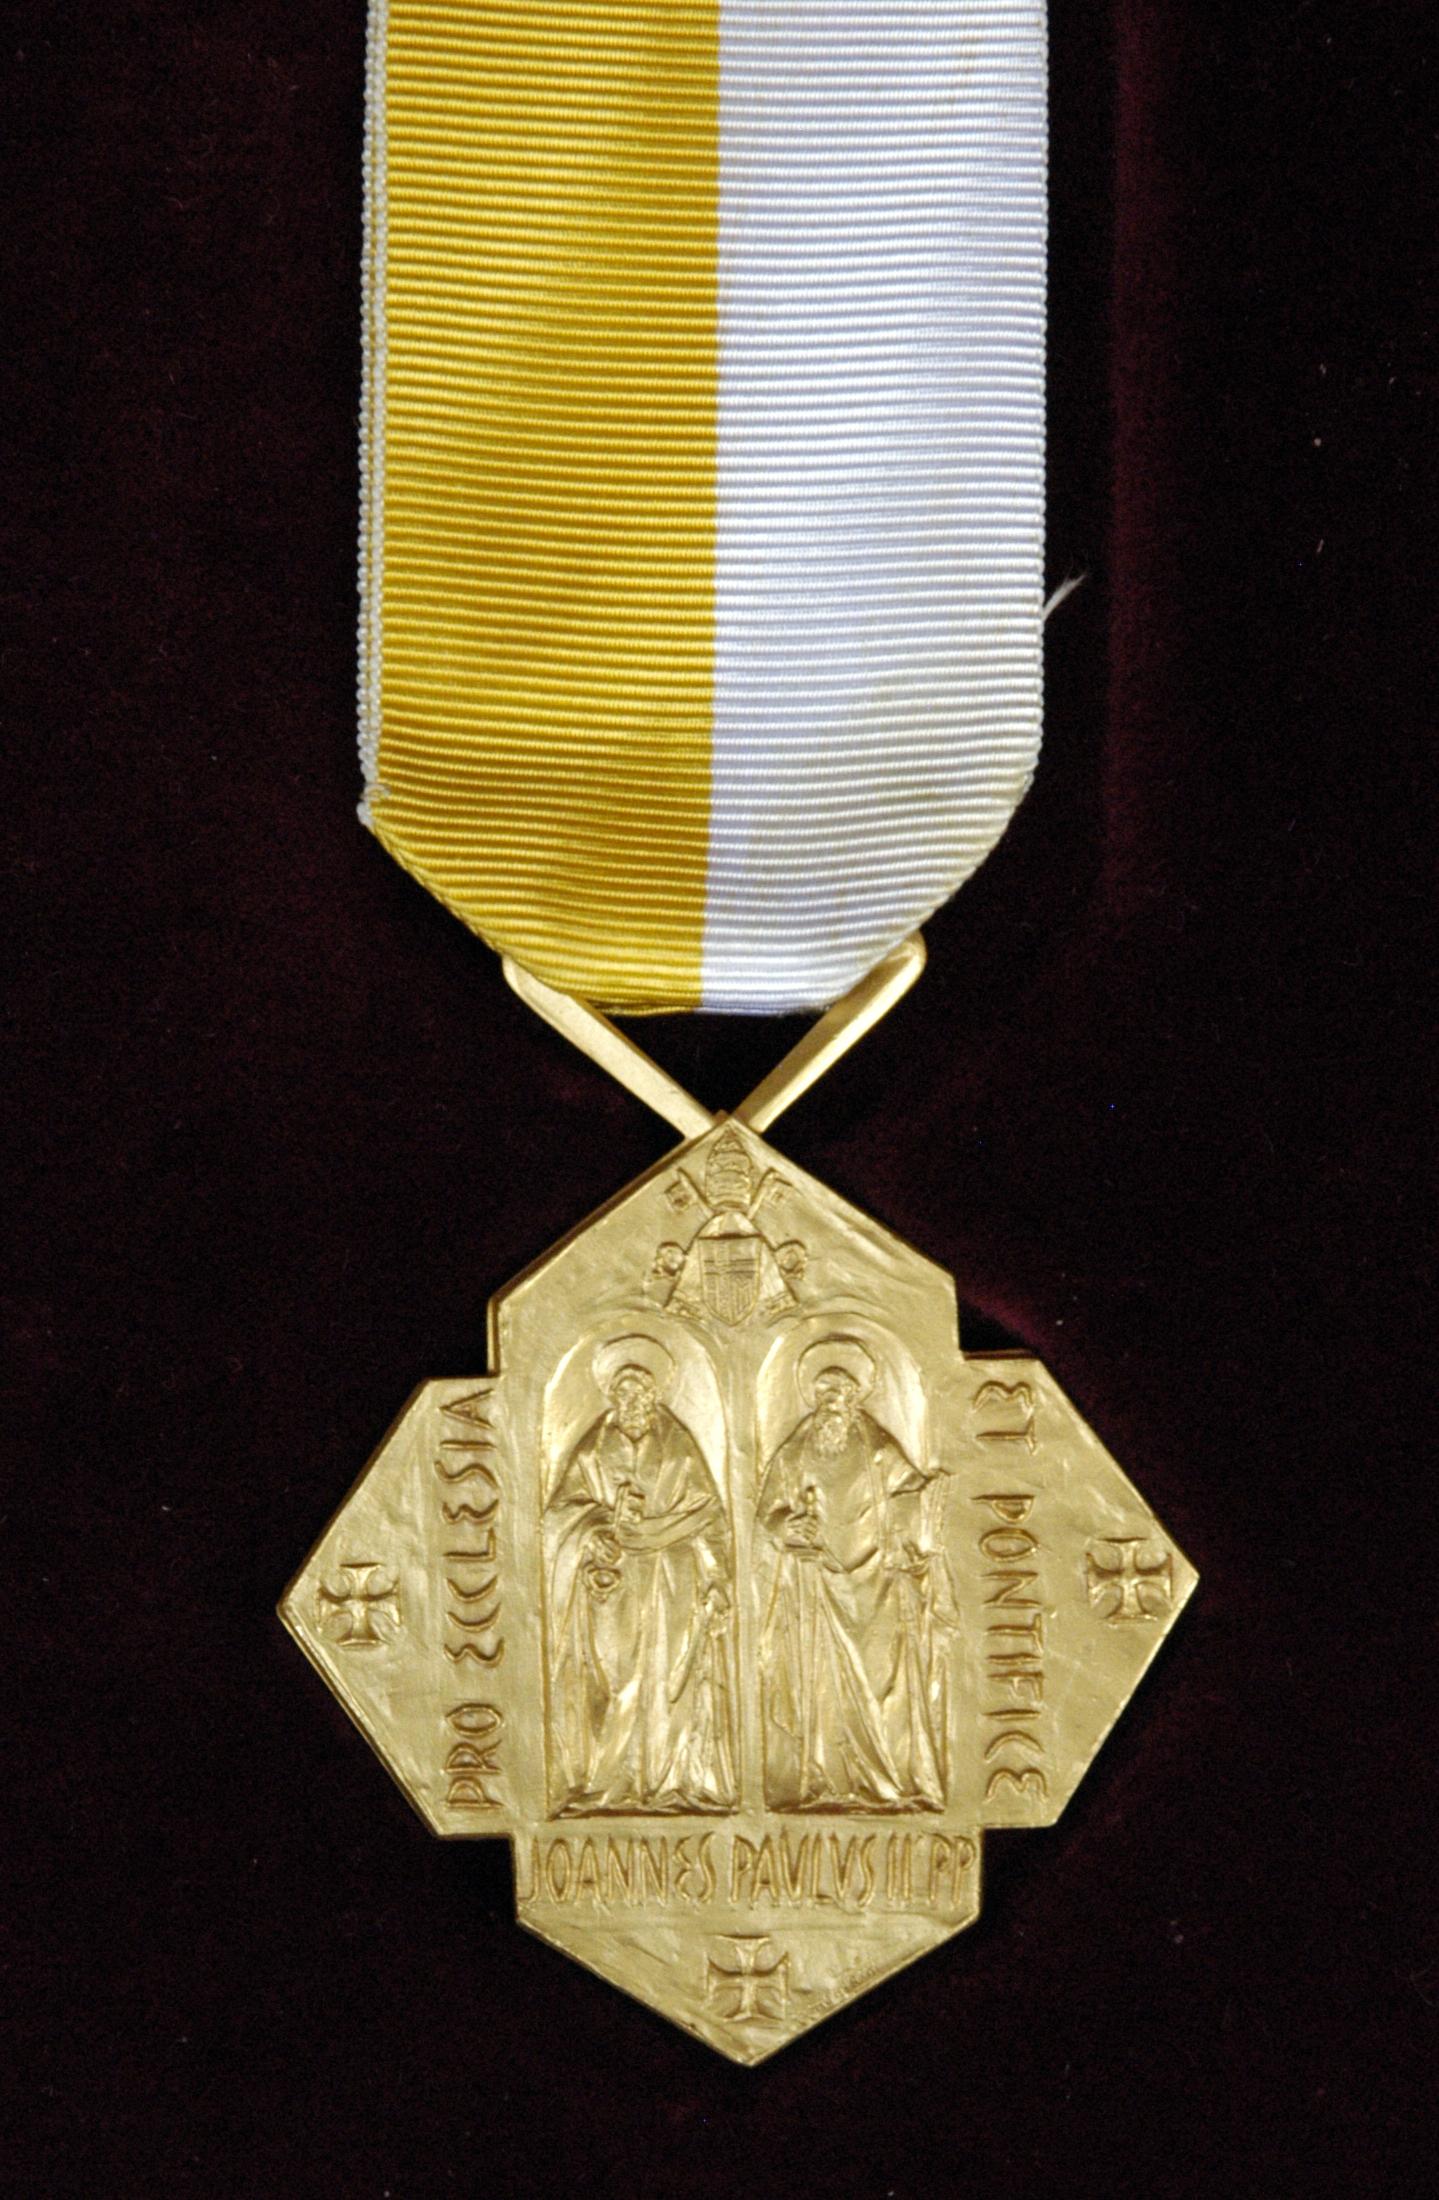 Medalla Pro Ecclesia et Pontifice - Wikipedia, la enciclopedia libre